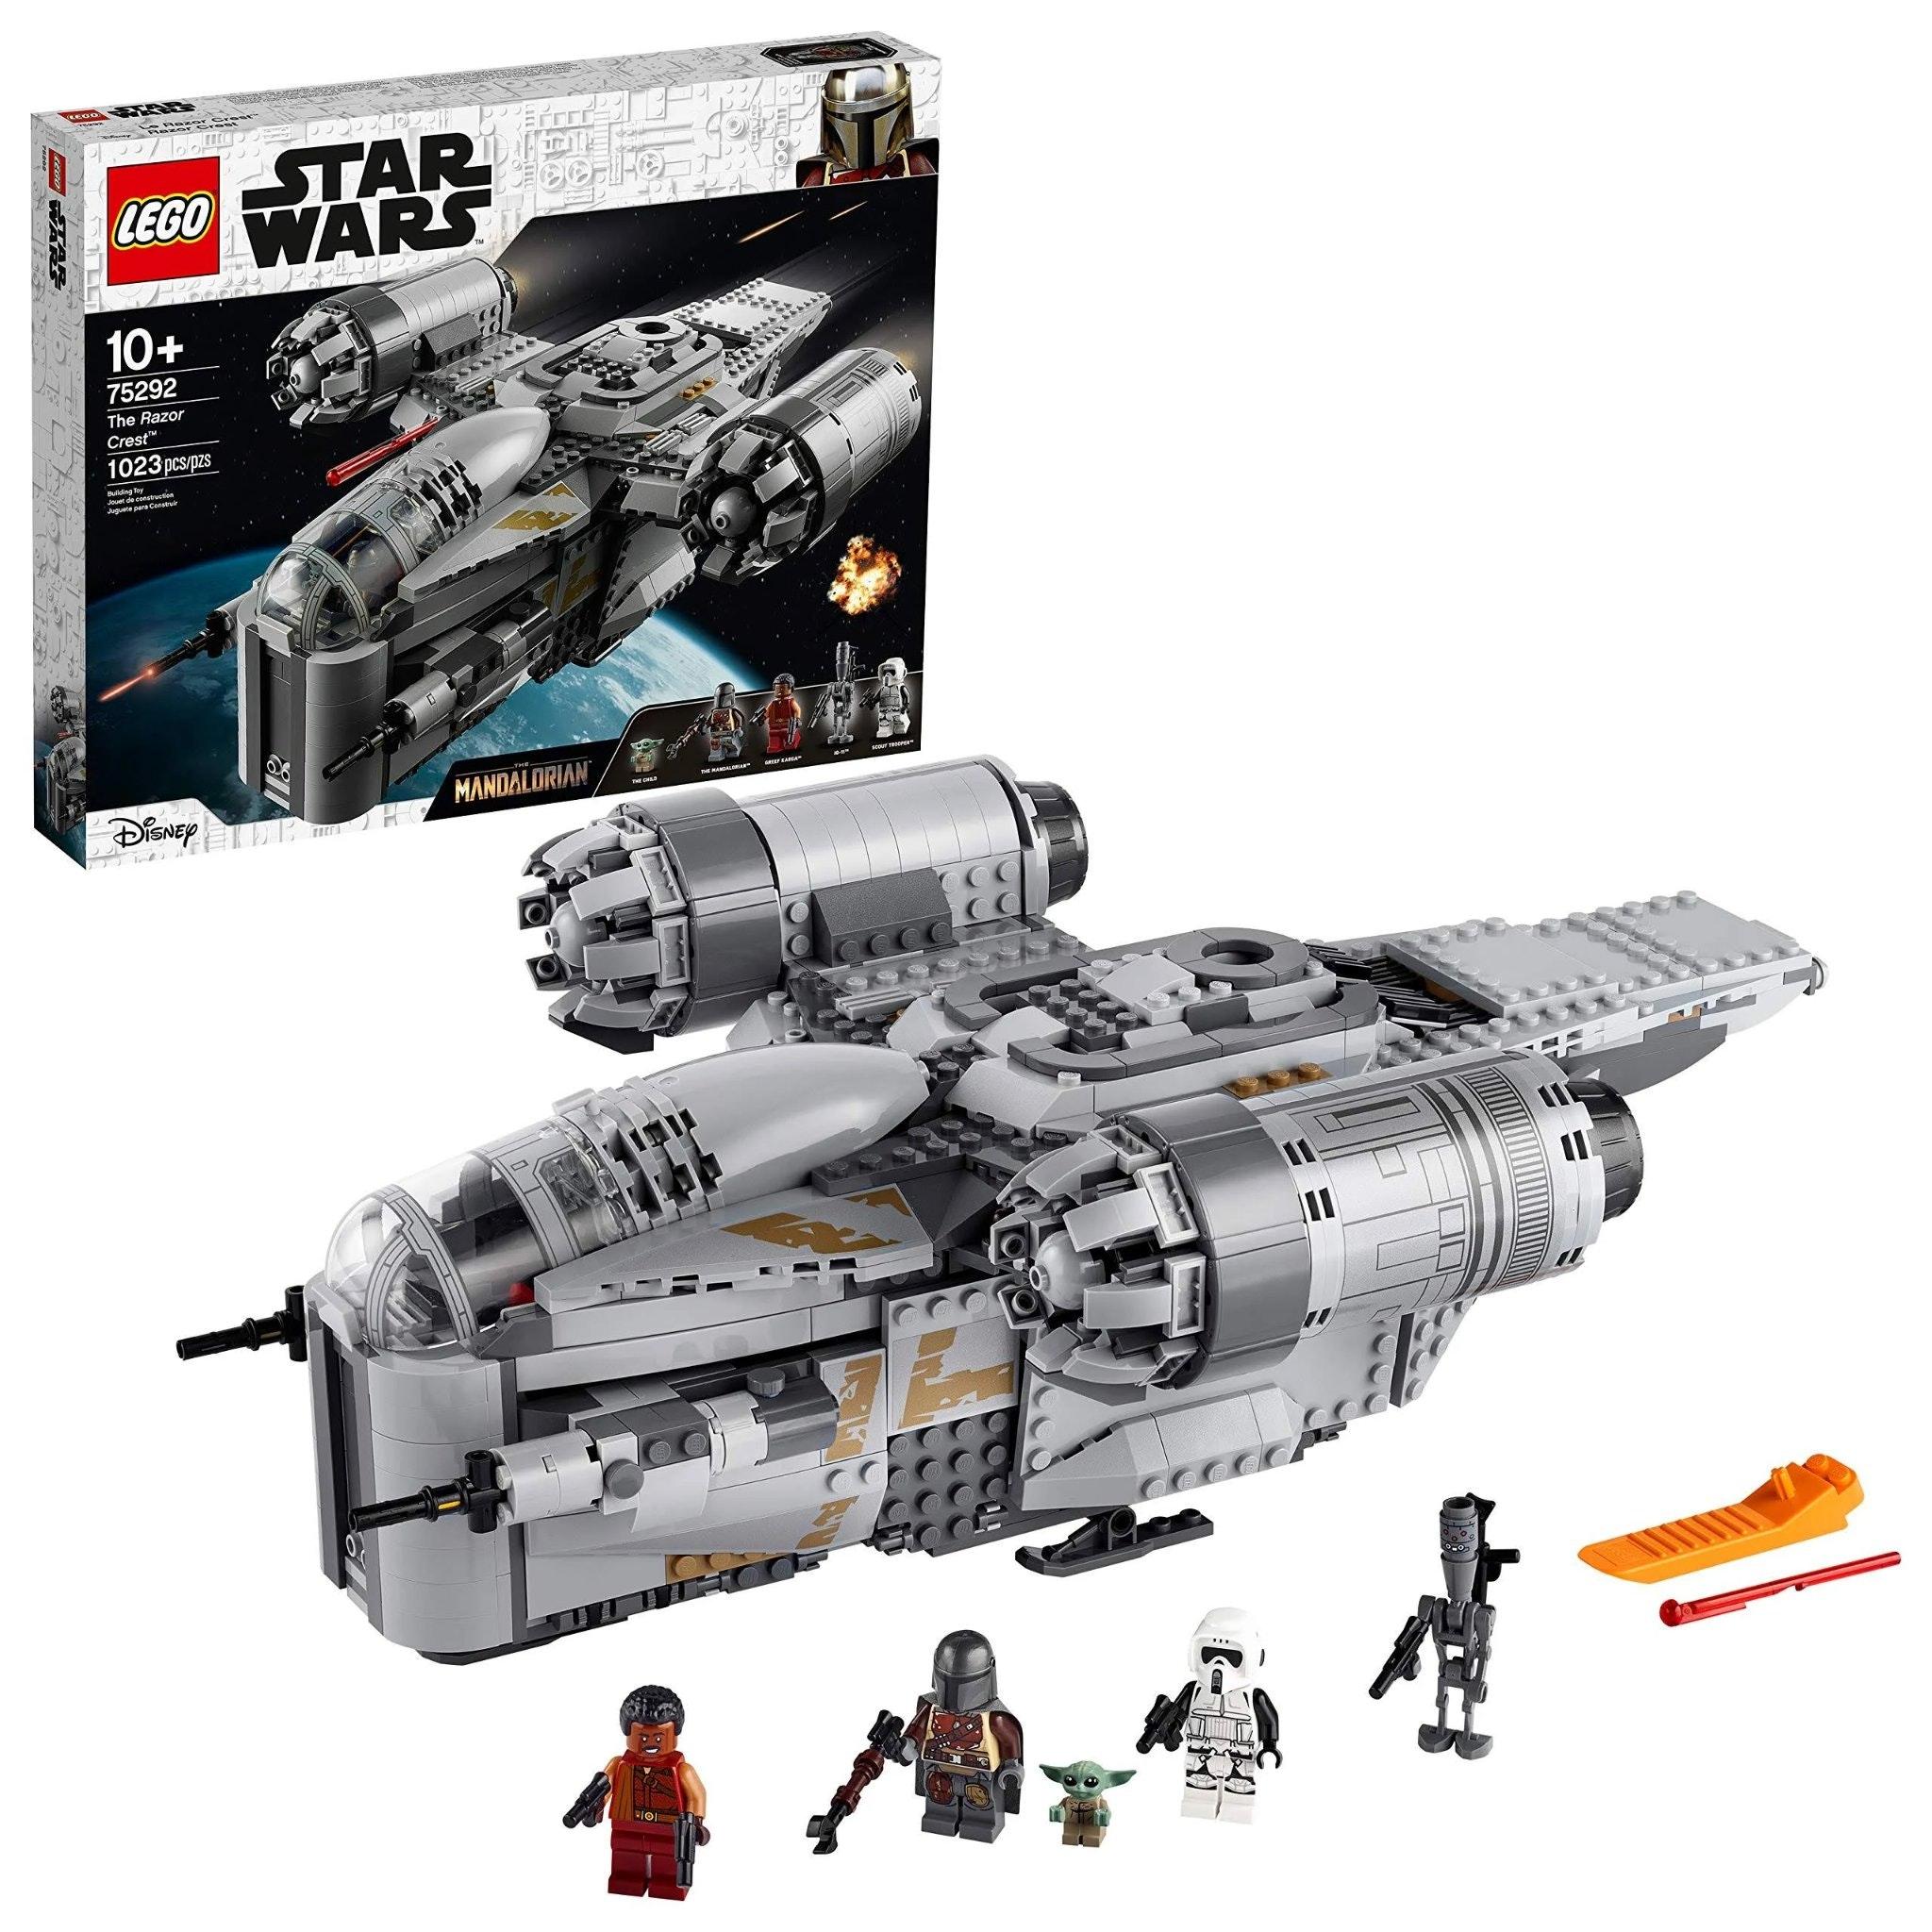 Lego Star Wars: the Mandalorian the Razor Crest 75292